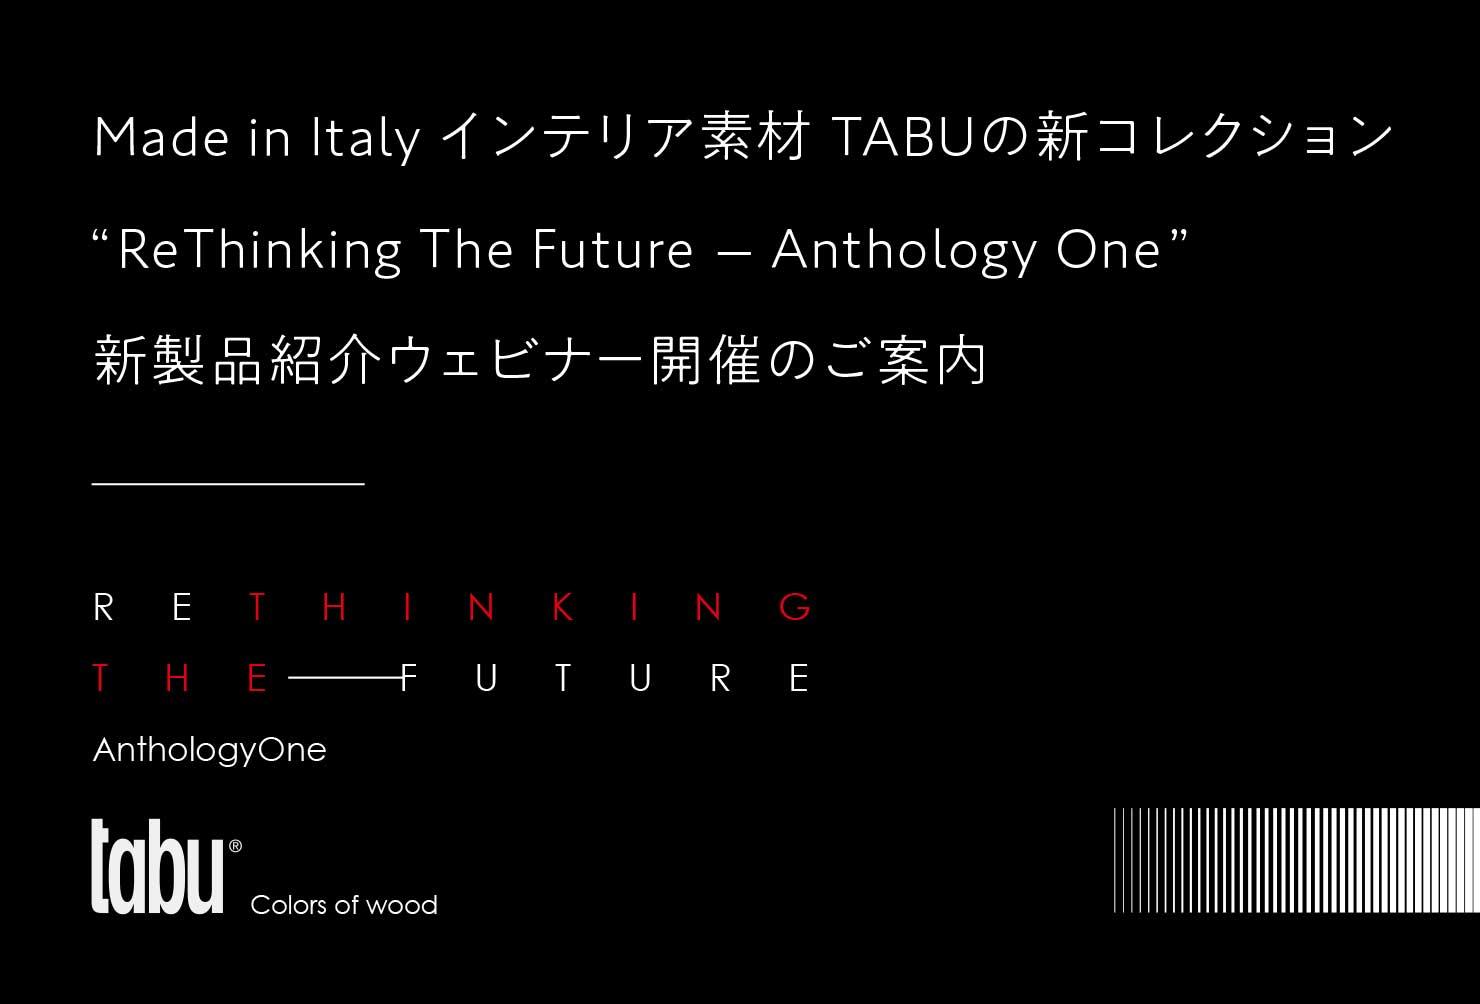 "Made in Italy インテリア素材 TABUの新コレクション ""ReThinking The Future − Anthology One"" 新製品紹介ウェビナー開催のご案内"